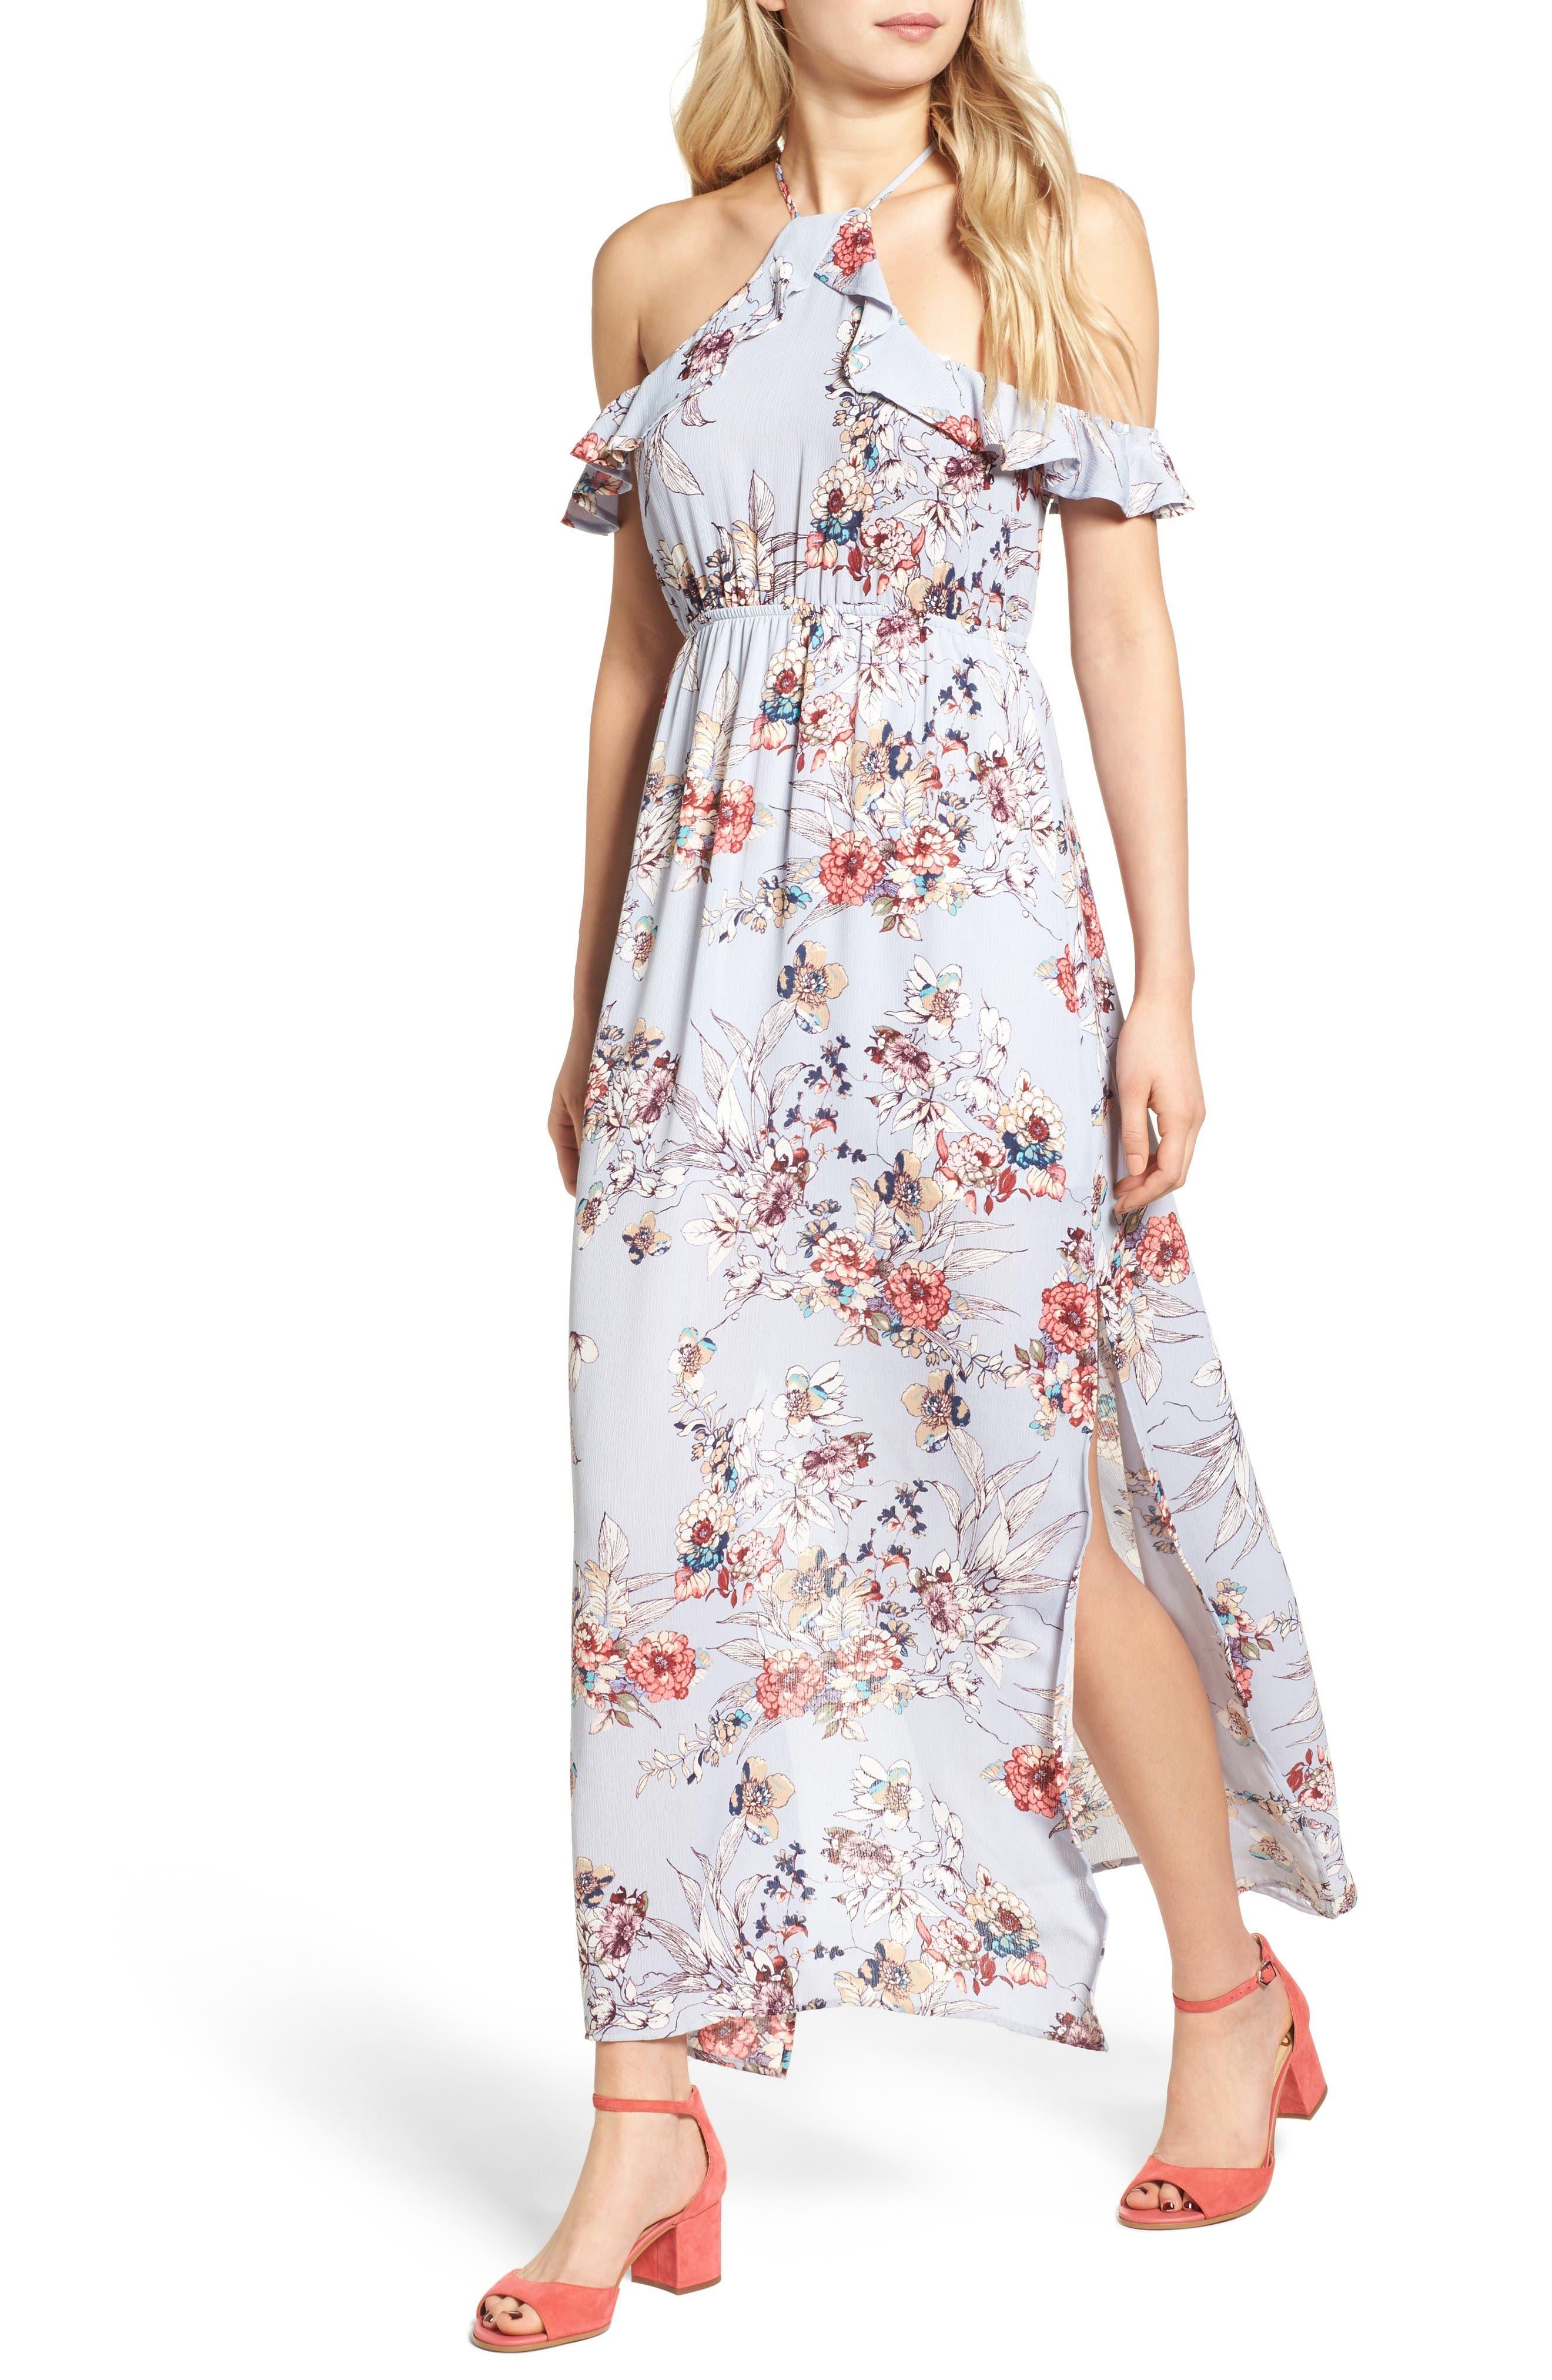 Alternate Image 1 Selected - One Clothing Floral Cold Shoulder Maxi Dress